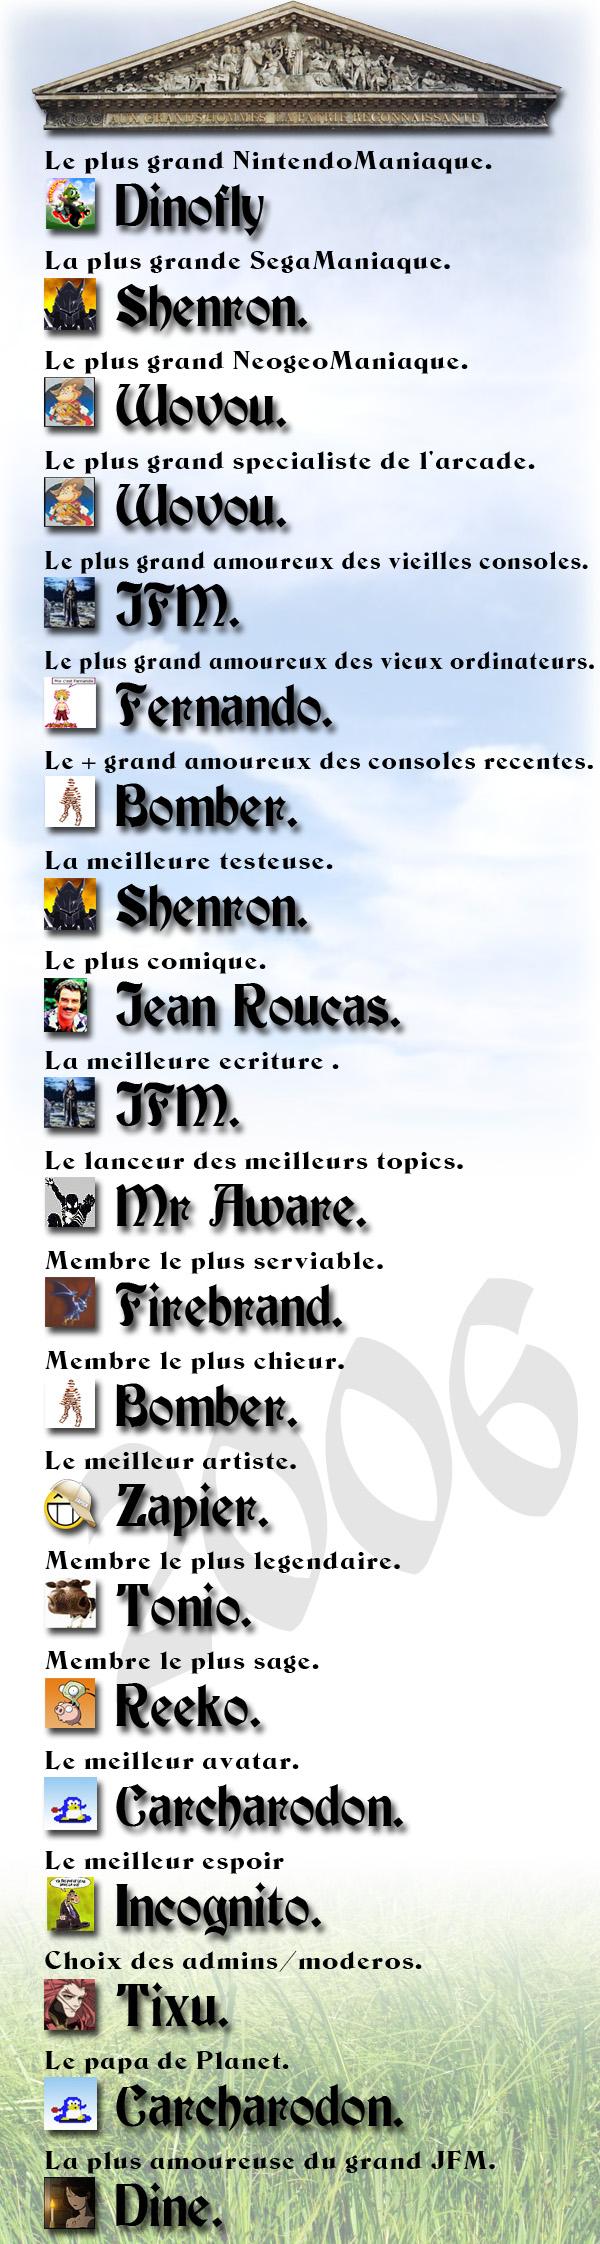 http://www.planetemu.net/php/articles/files/Image/zapier/planetars/2006.jpg